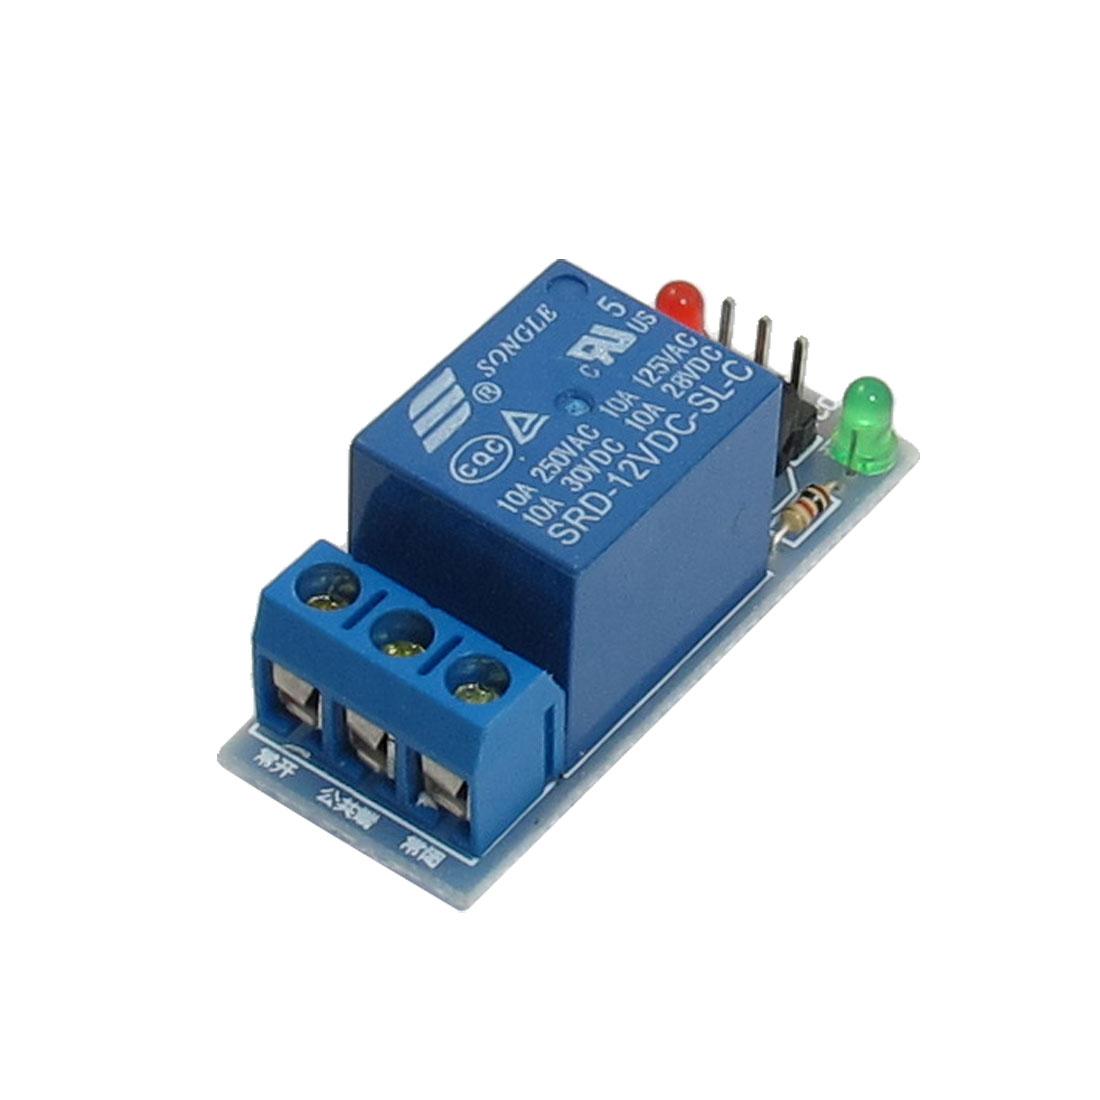 DC 12V Coil 10A Power 1 Channel Relay Module 250V/125VAC 30V/28VDC